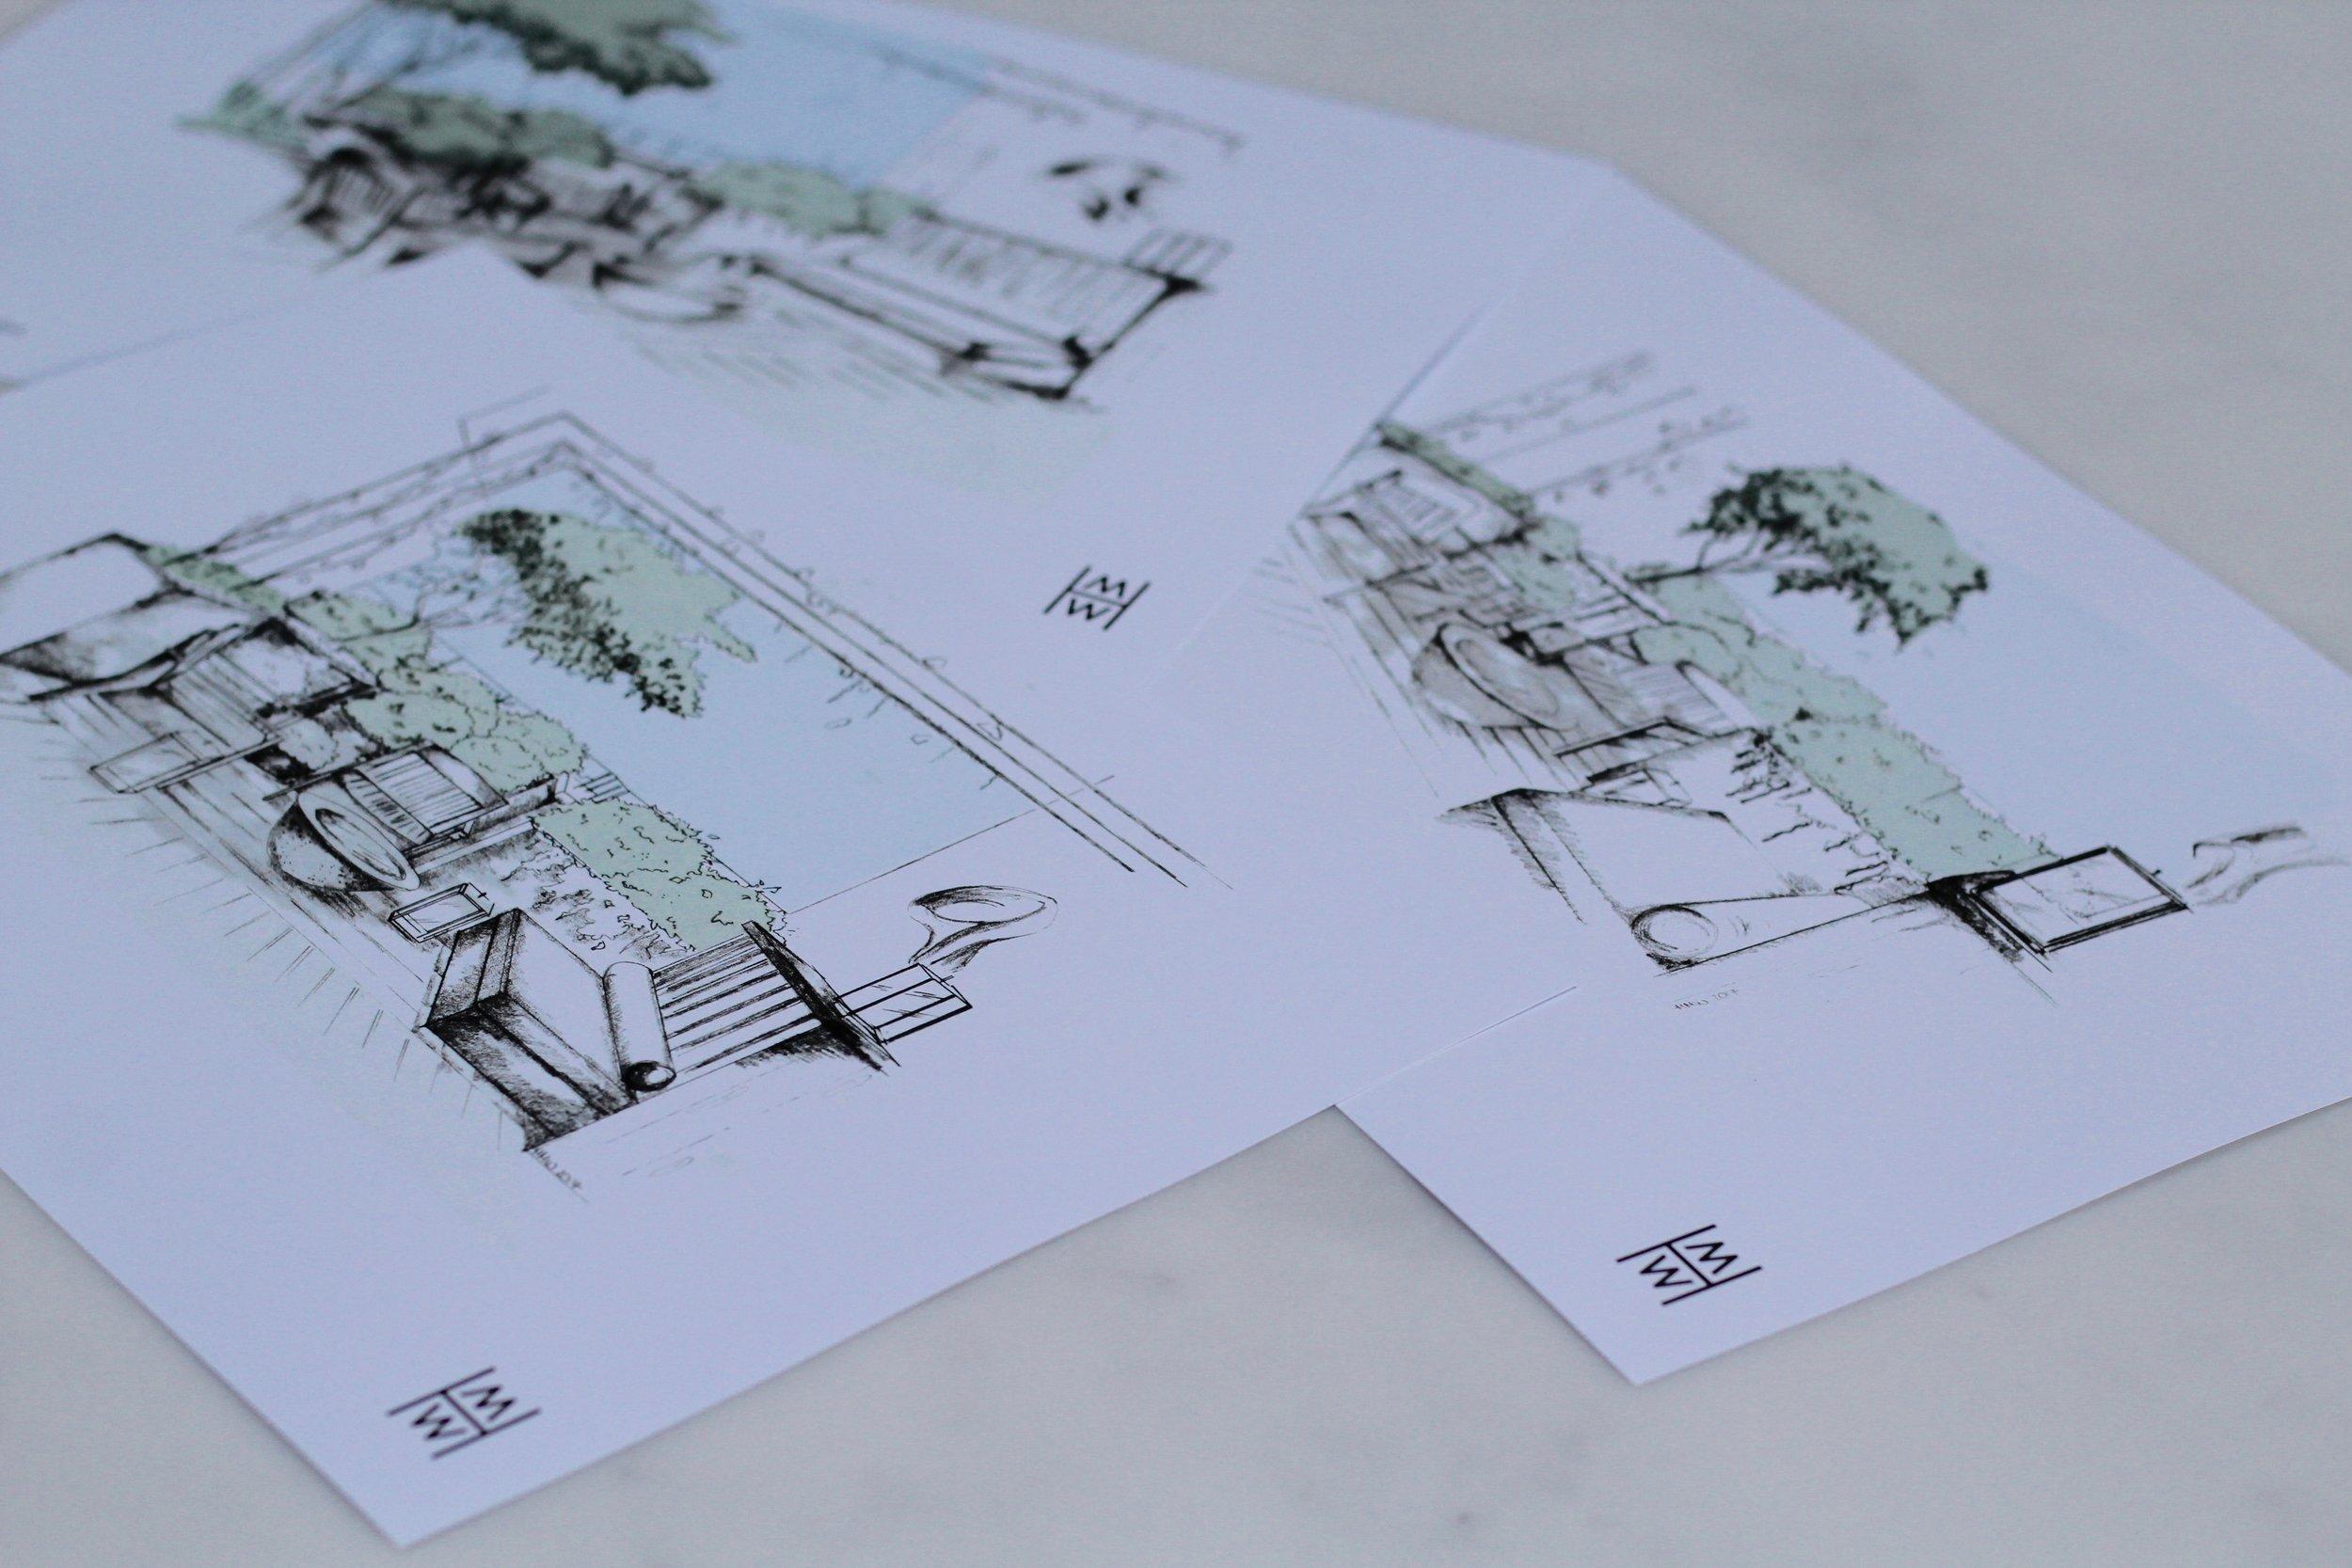 HMW Roof terrace concept - Belgravia.jpg